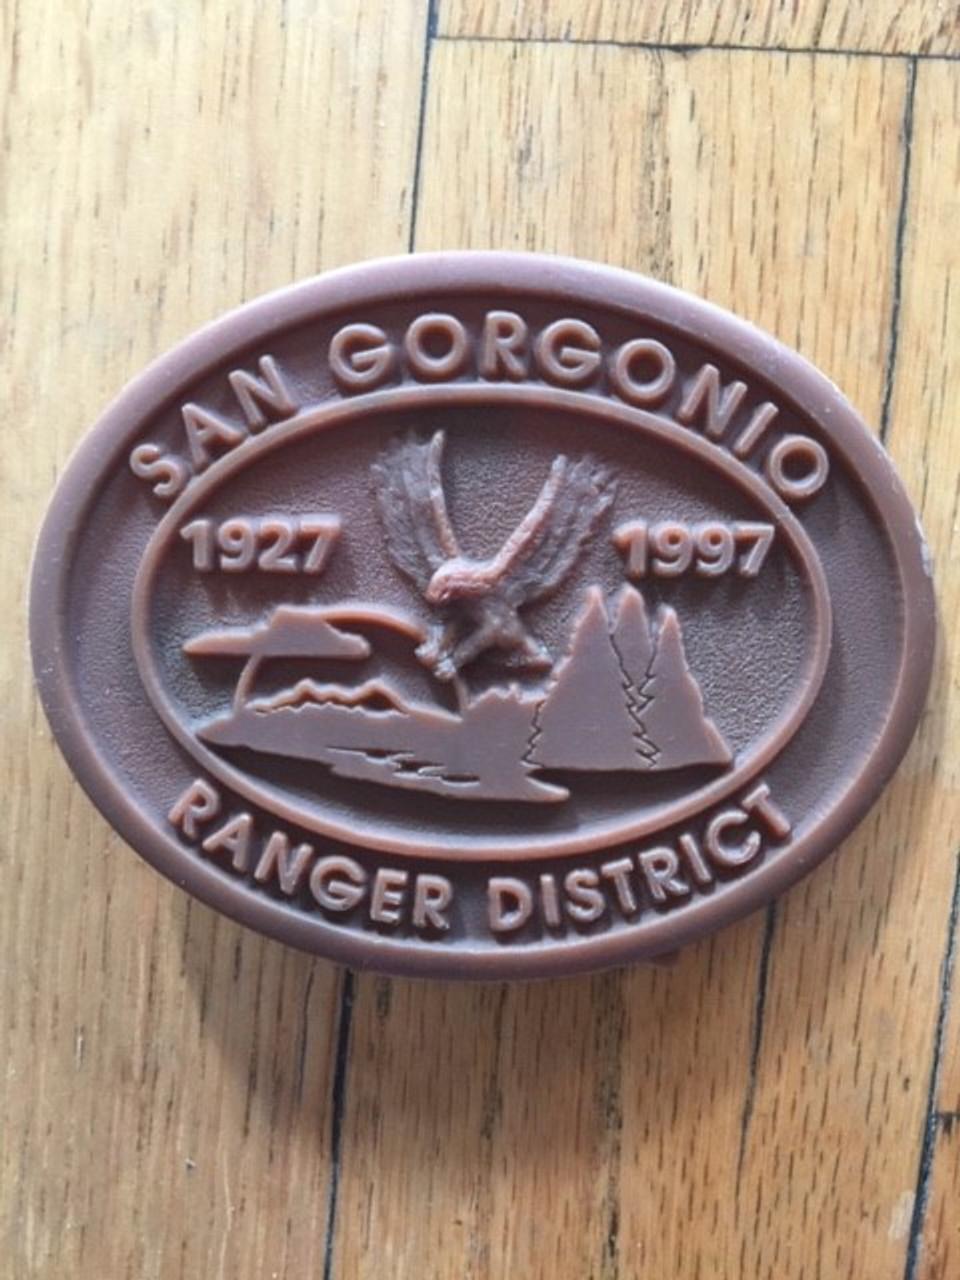 San Gorgonio Ranger District Buckle